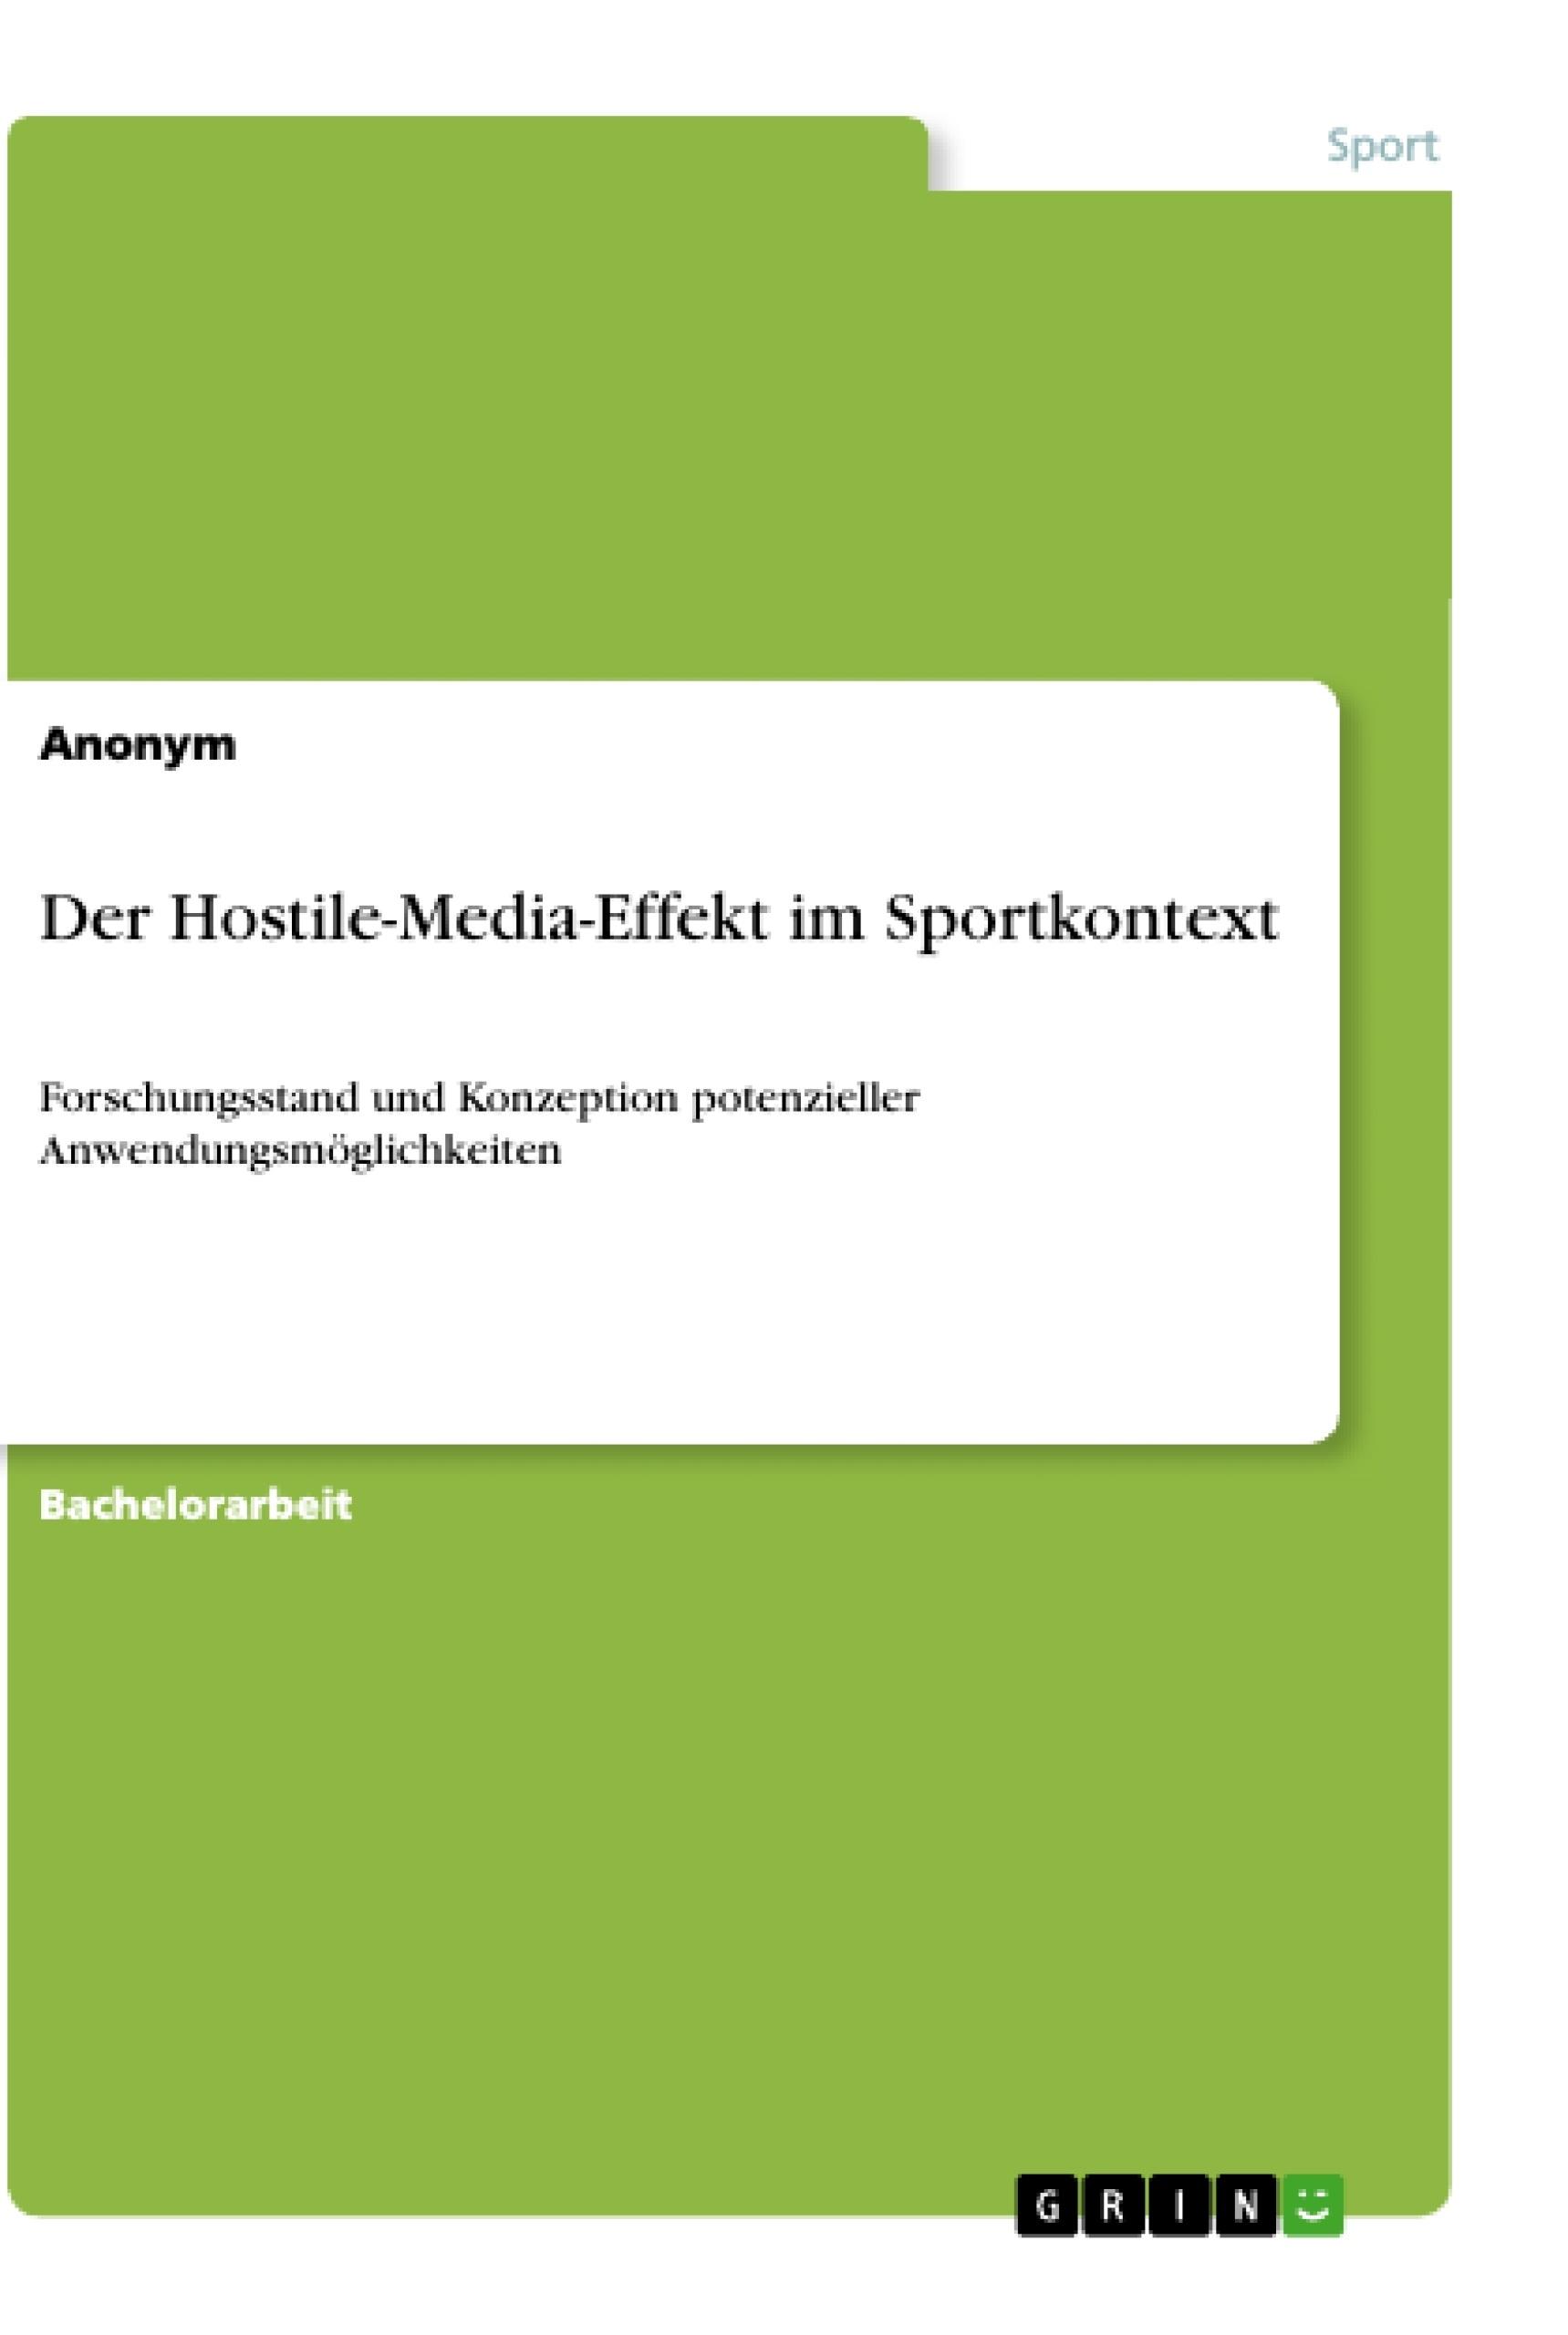 Titel: Der Hostile-Media-Effekt im Sportkontext